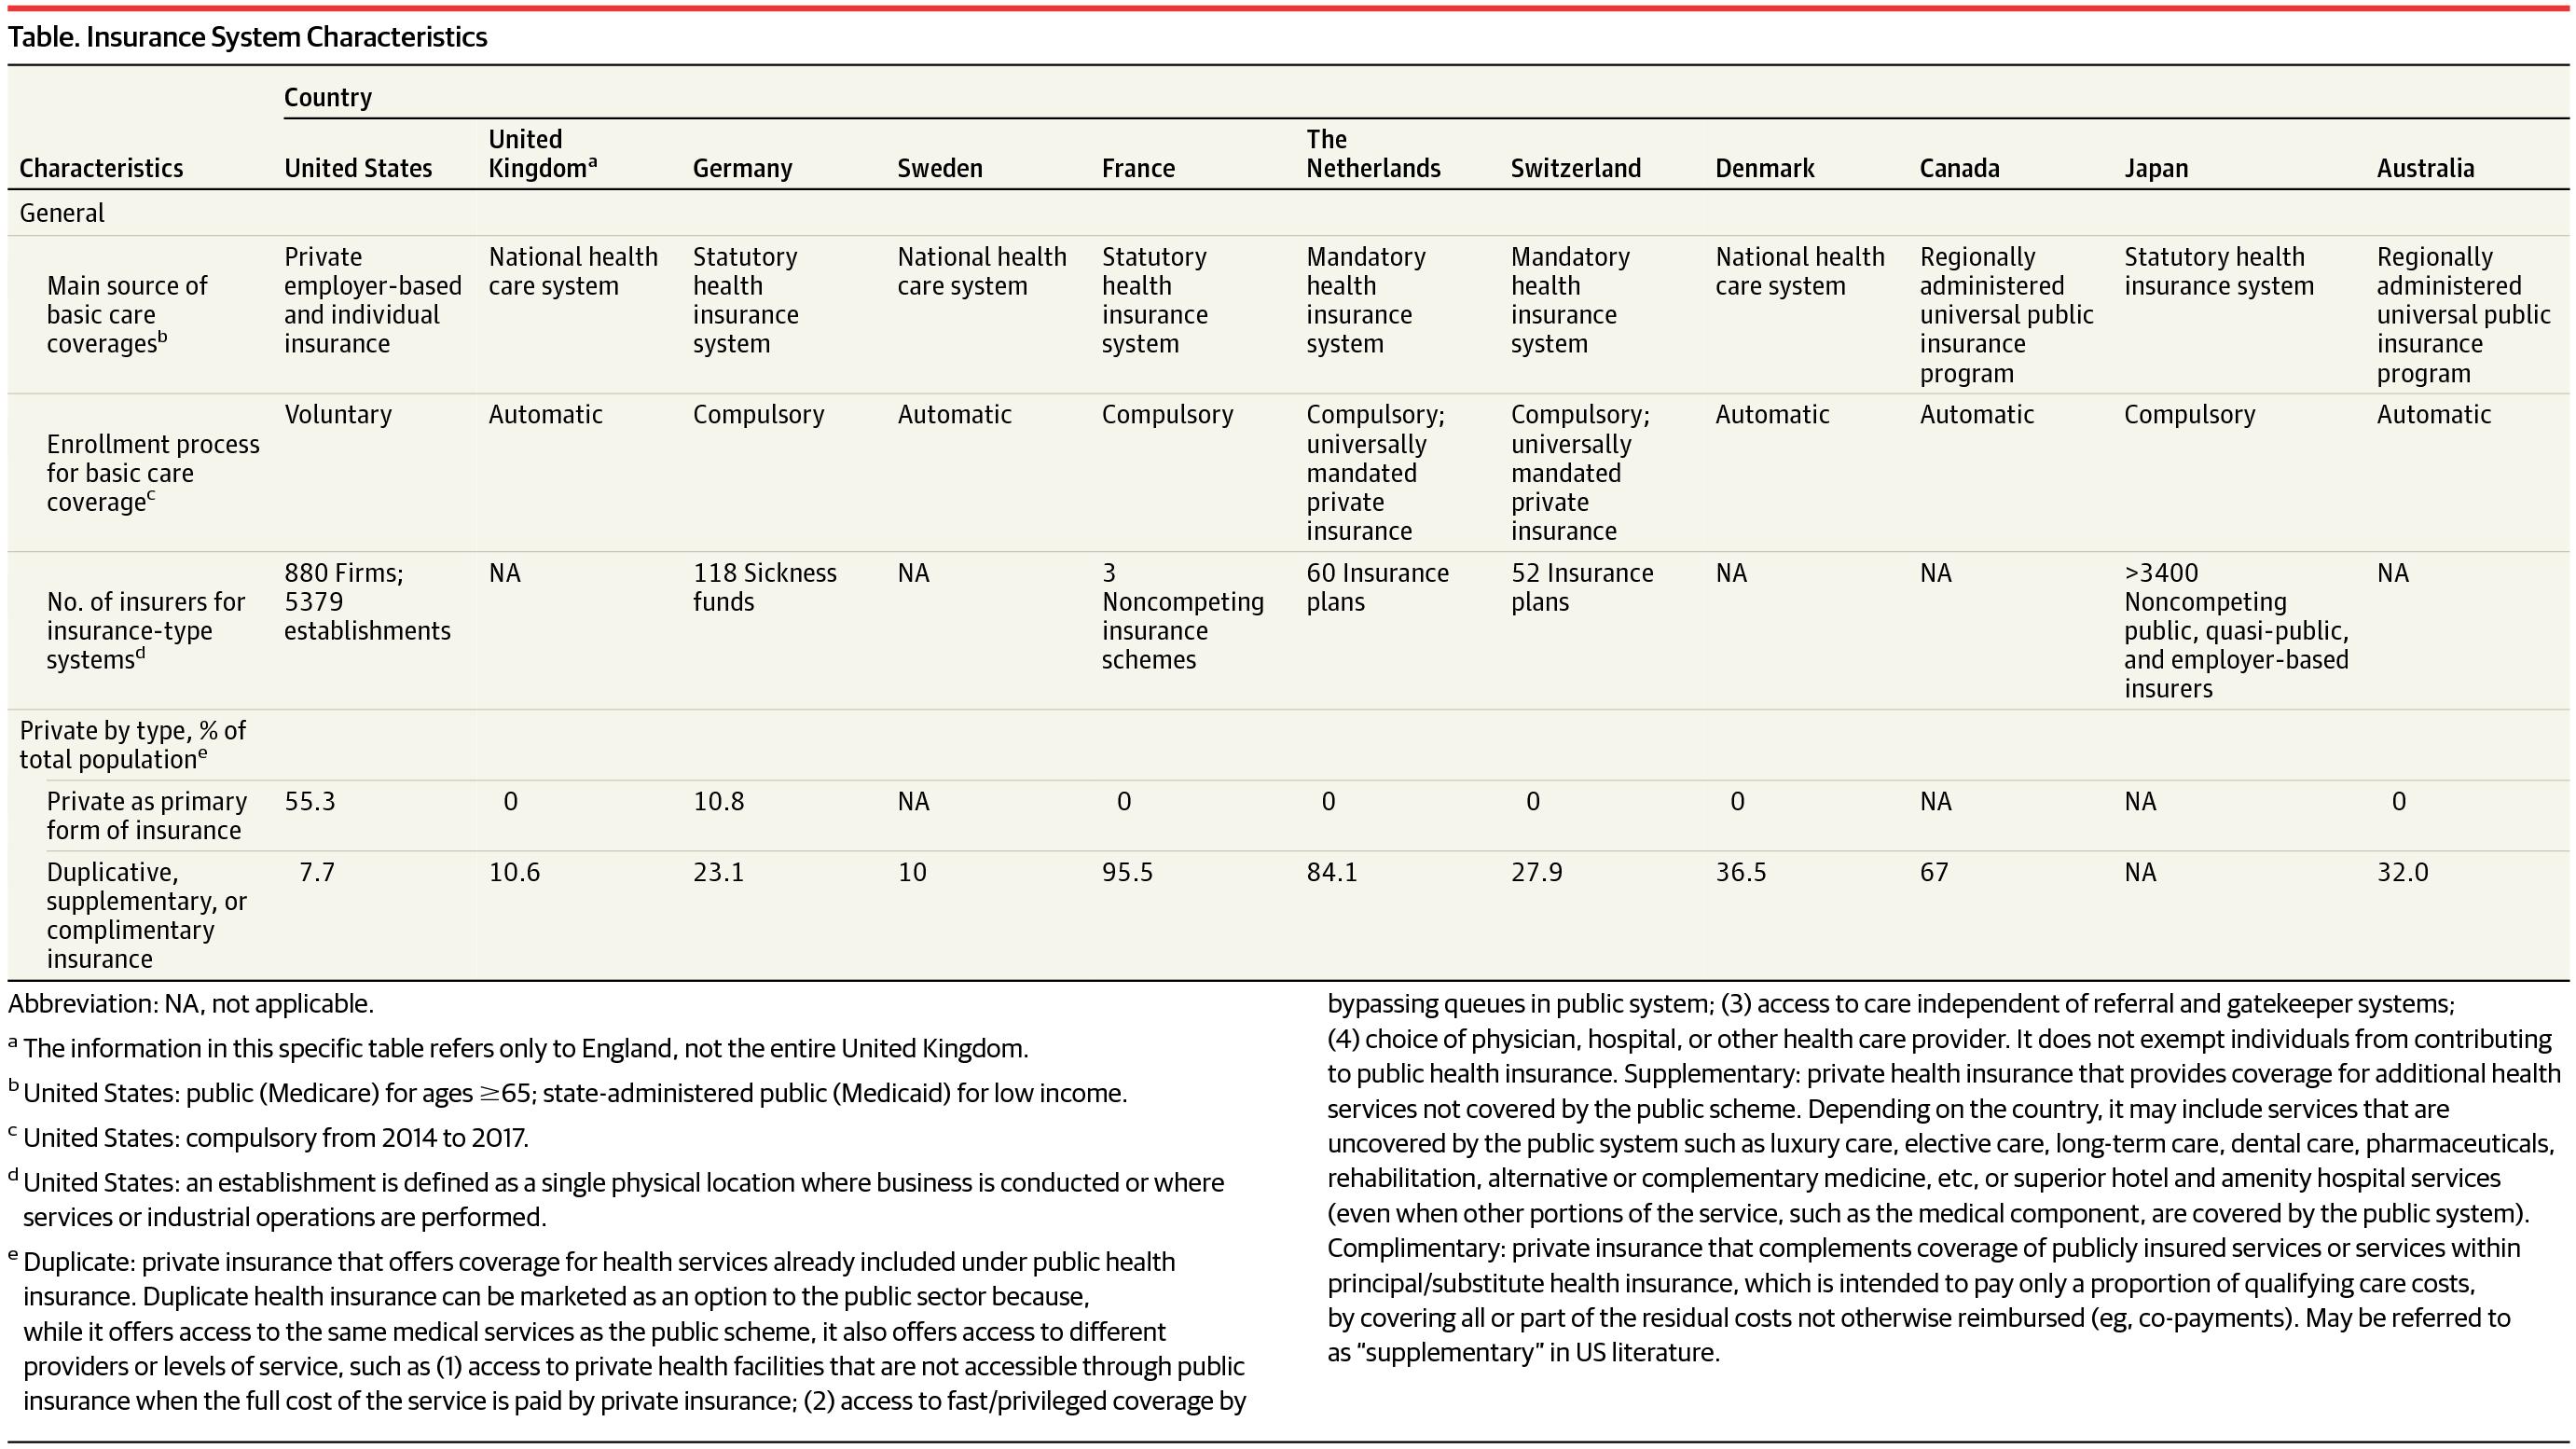 [JAMA最新论文]:美国及其他高收入国家的医疗卫生费用